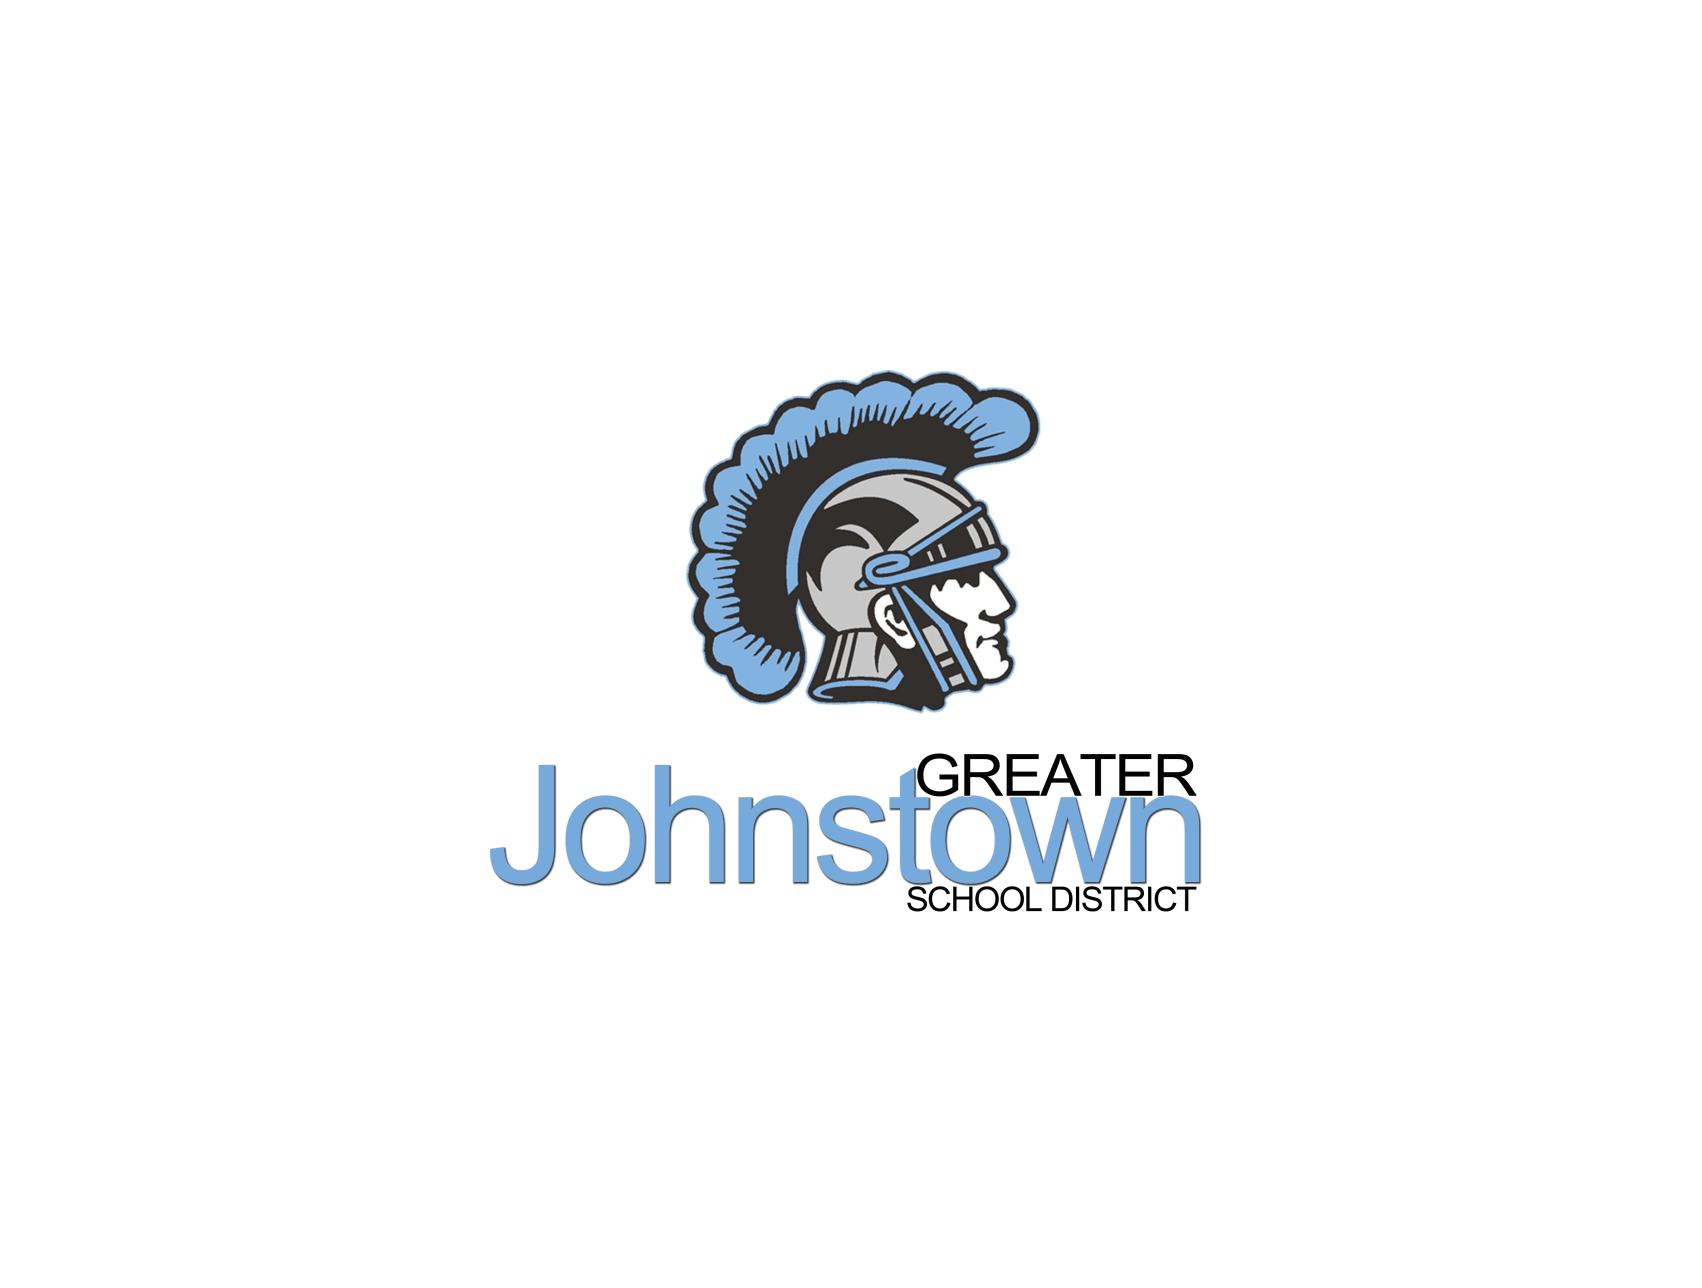 Greater Johnstown School District